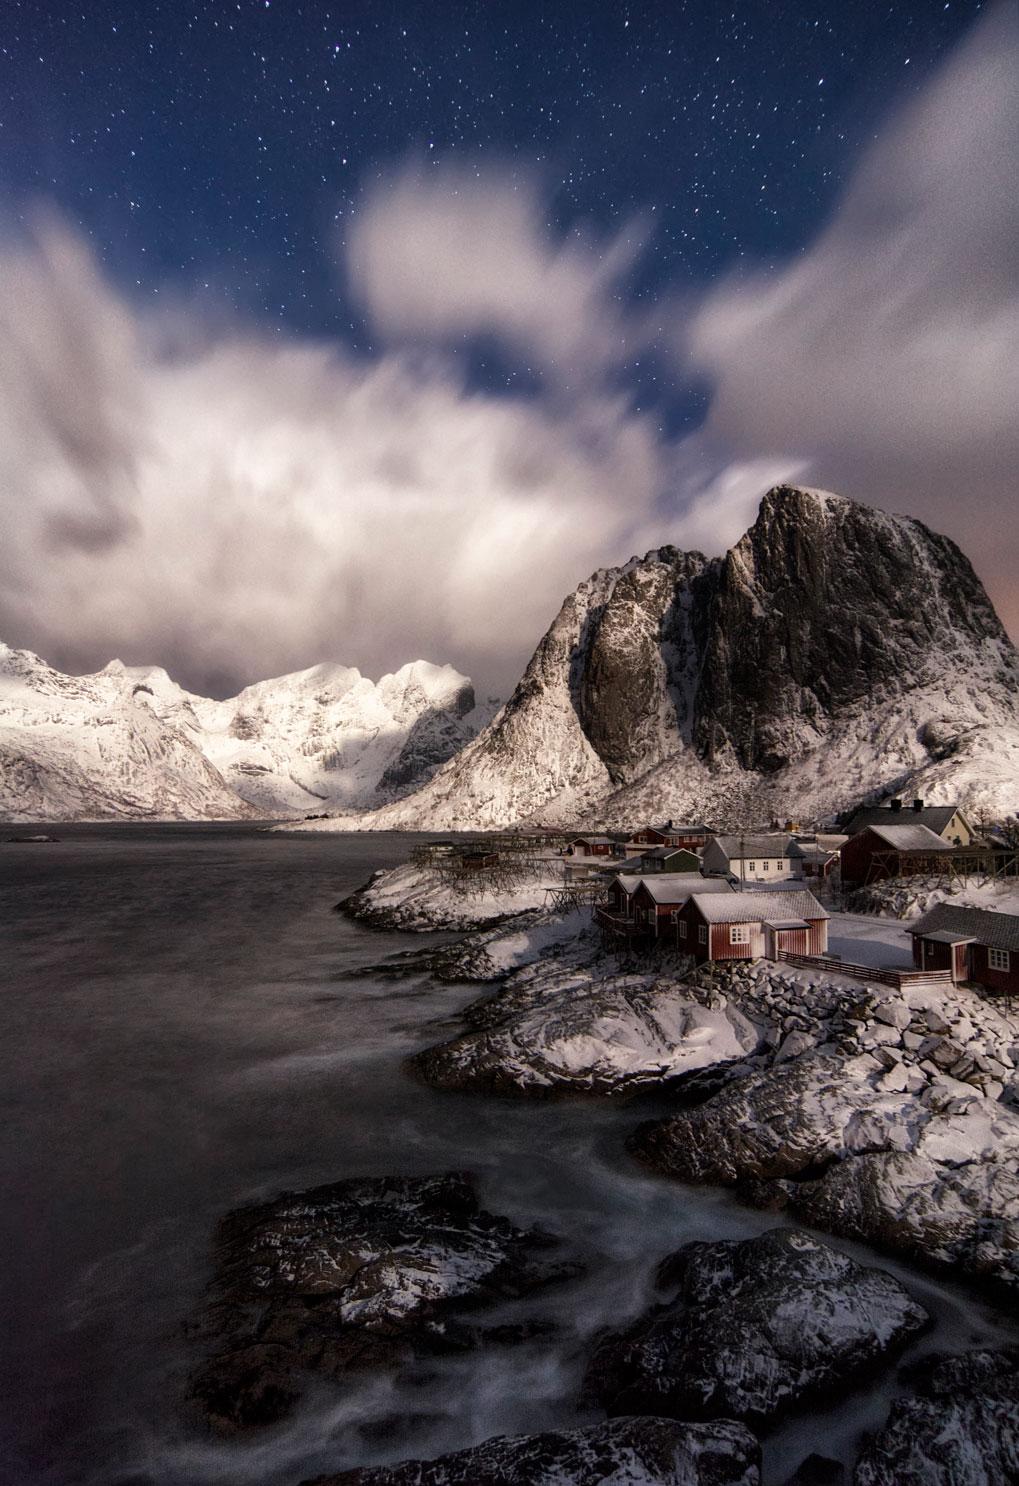 Lofoten - Archivo - Iñaki Larrea, Fotografía de naturaleza y montaña